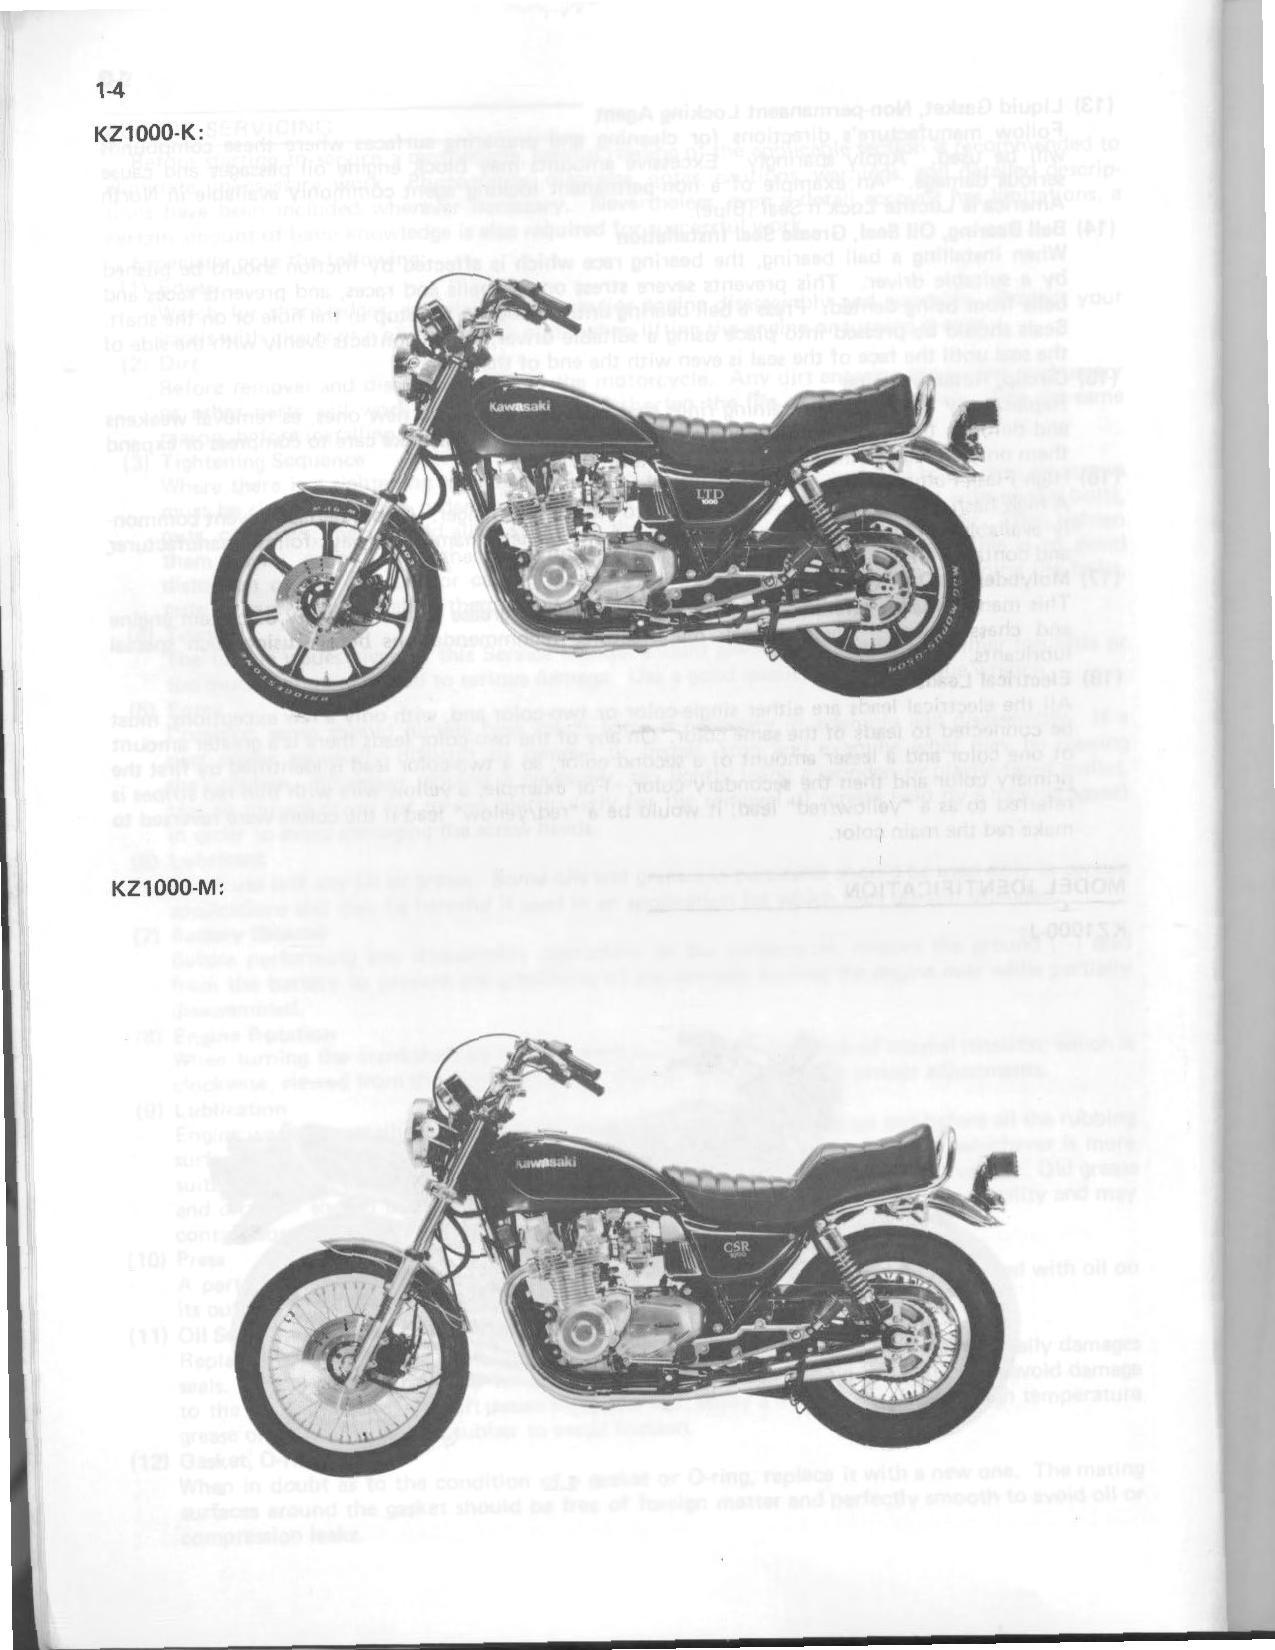 File:Kawasaki KZ1000 J KZ1100 1981-1983 Service Manual.pdf